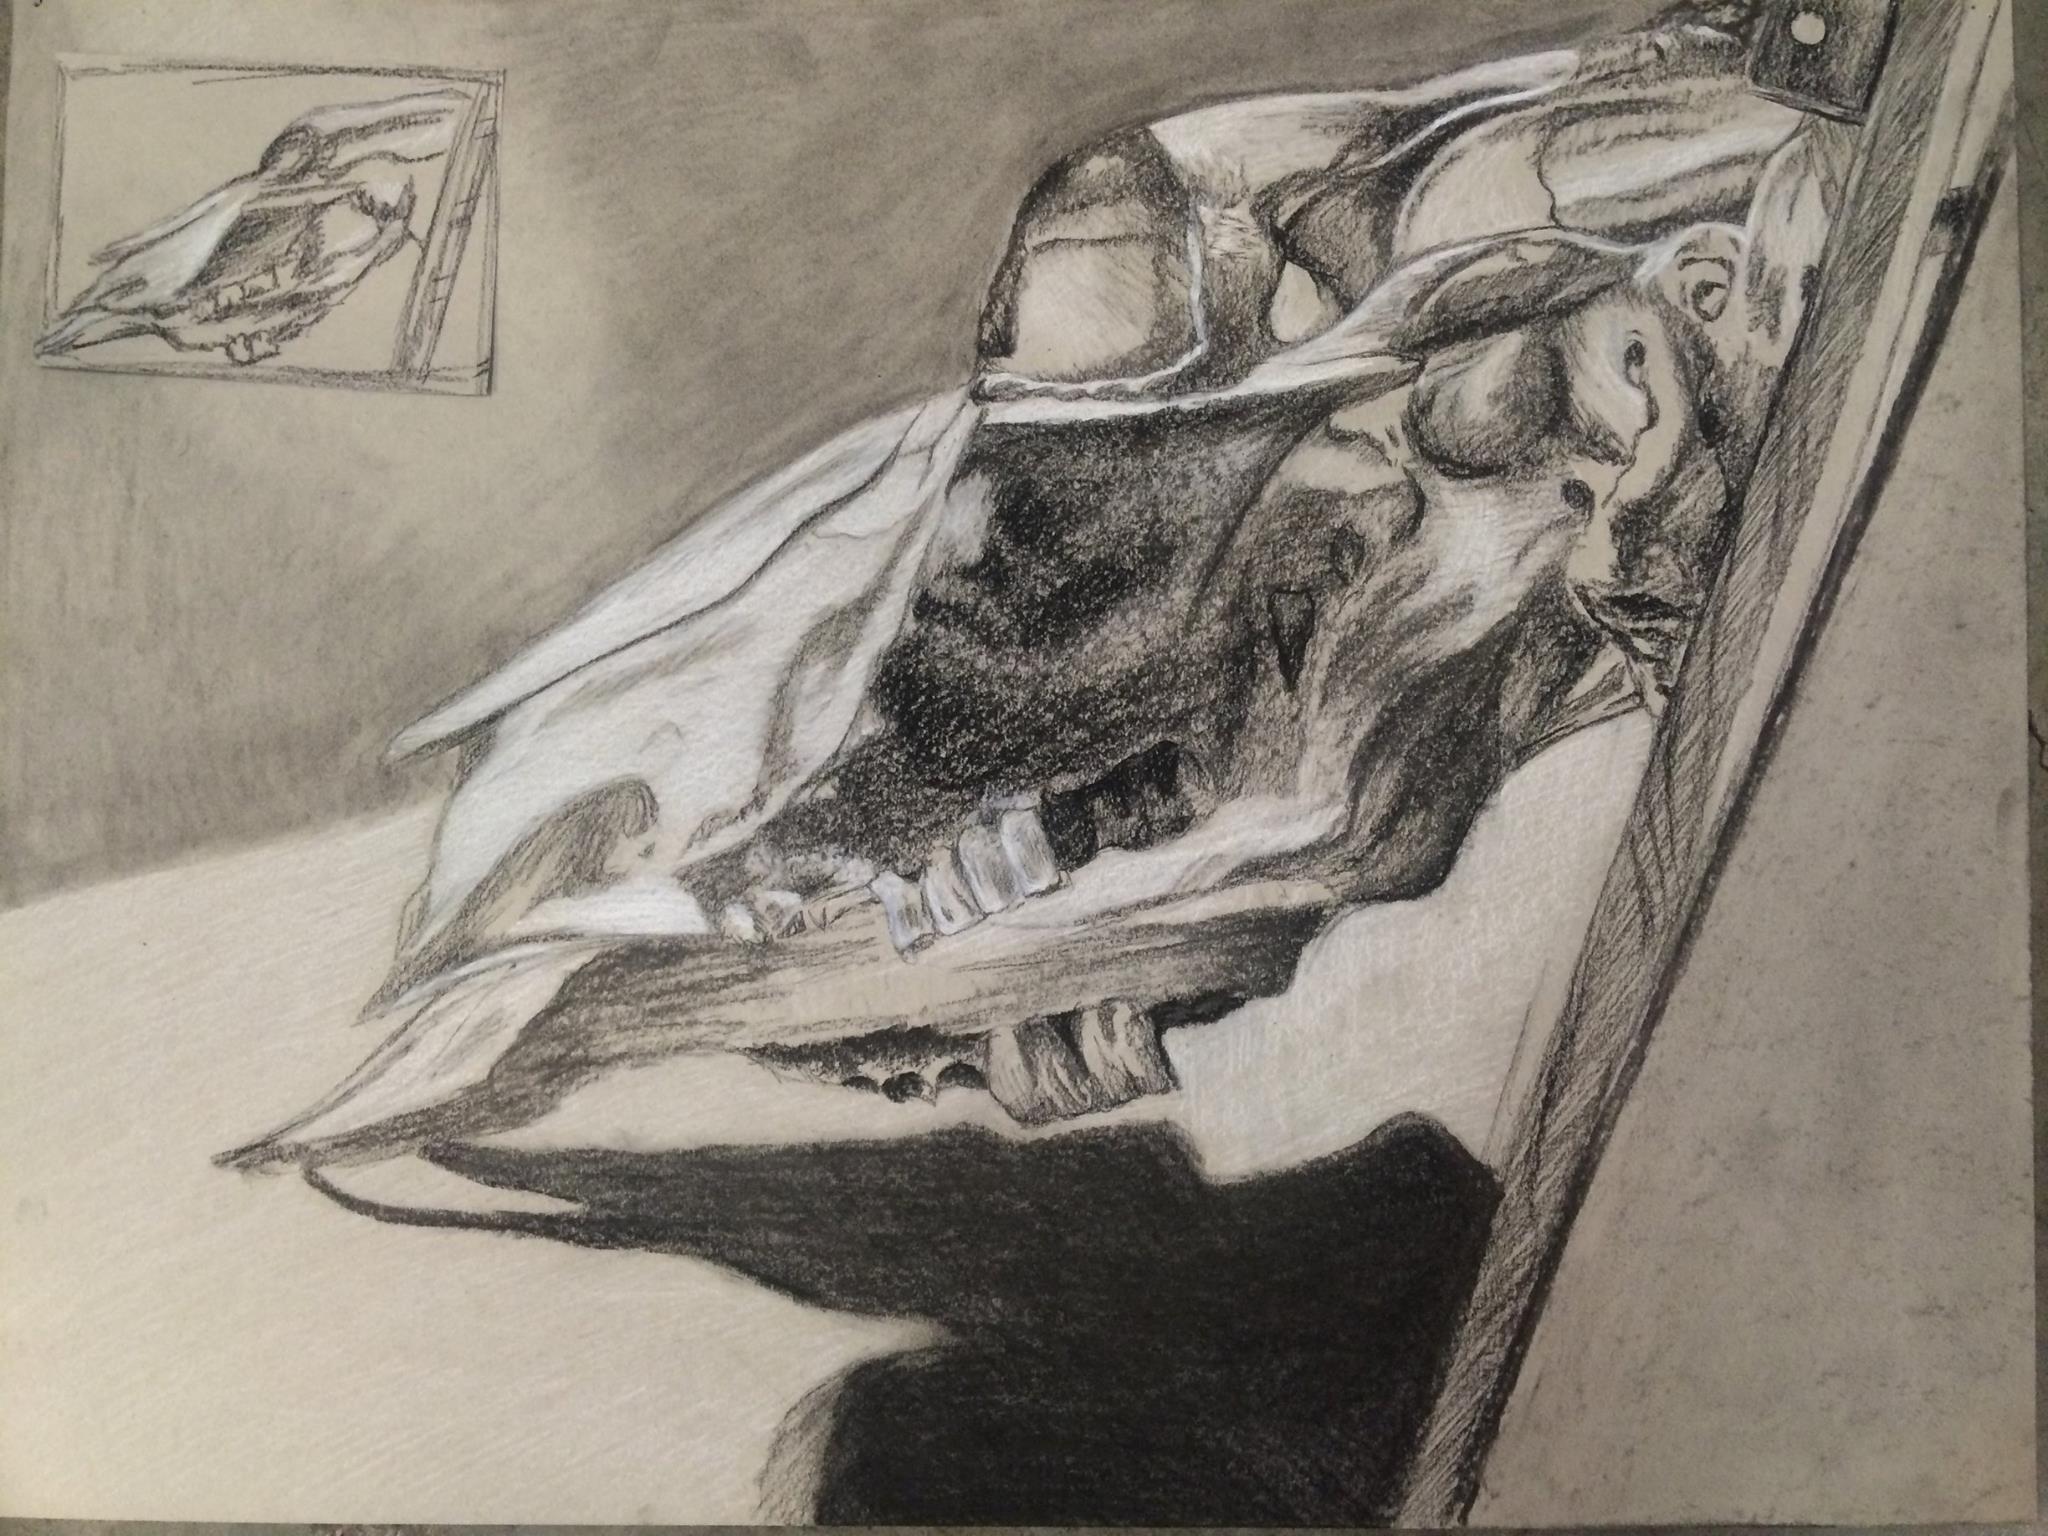 "Skull 18"" x 24"" Charcoal"